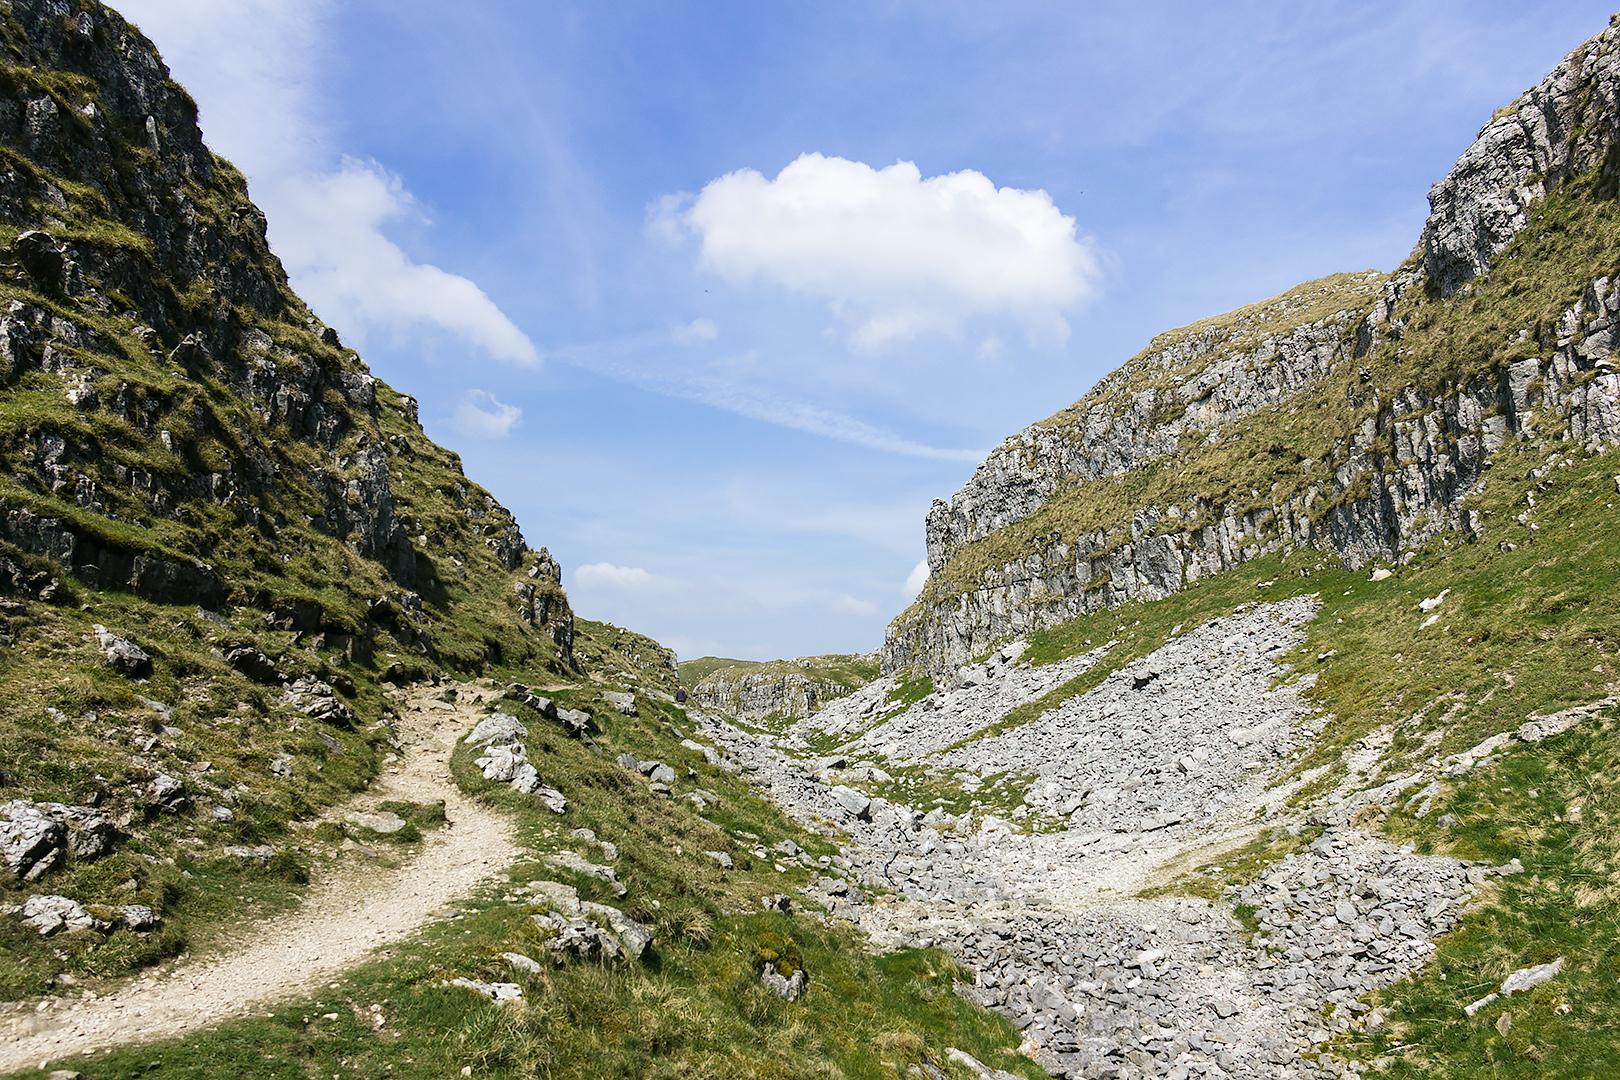 Rocky paths between Malham Tarn and Malham Cove